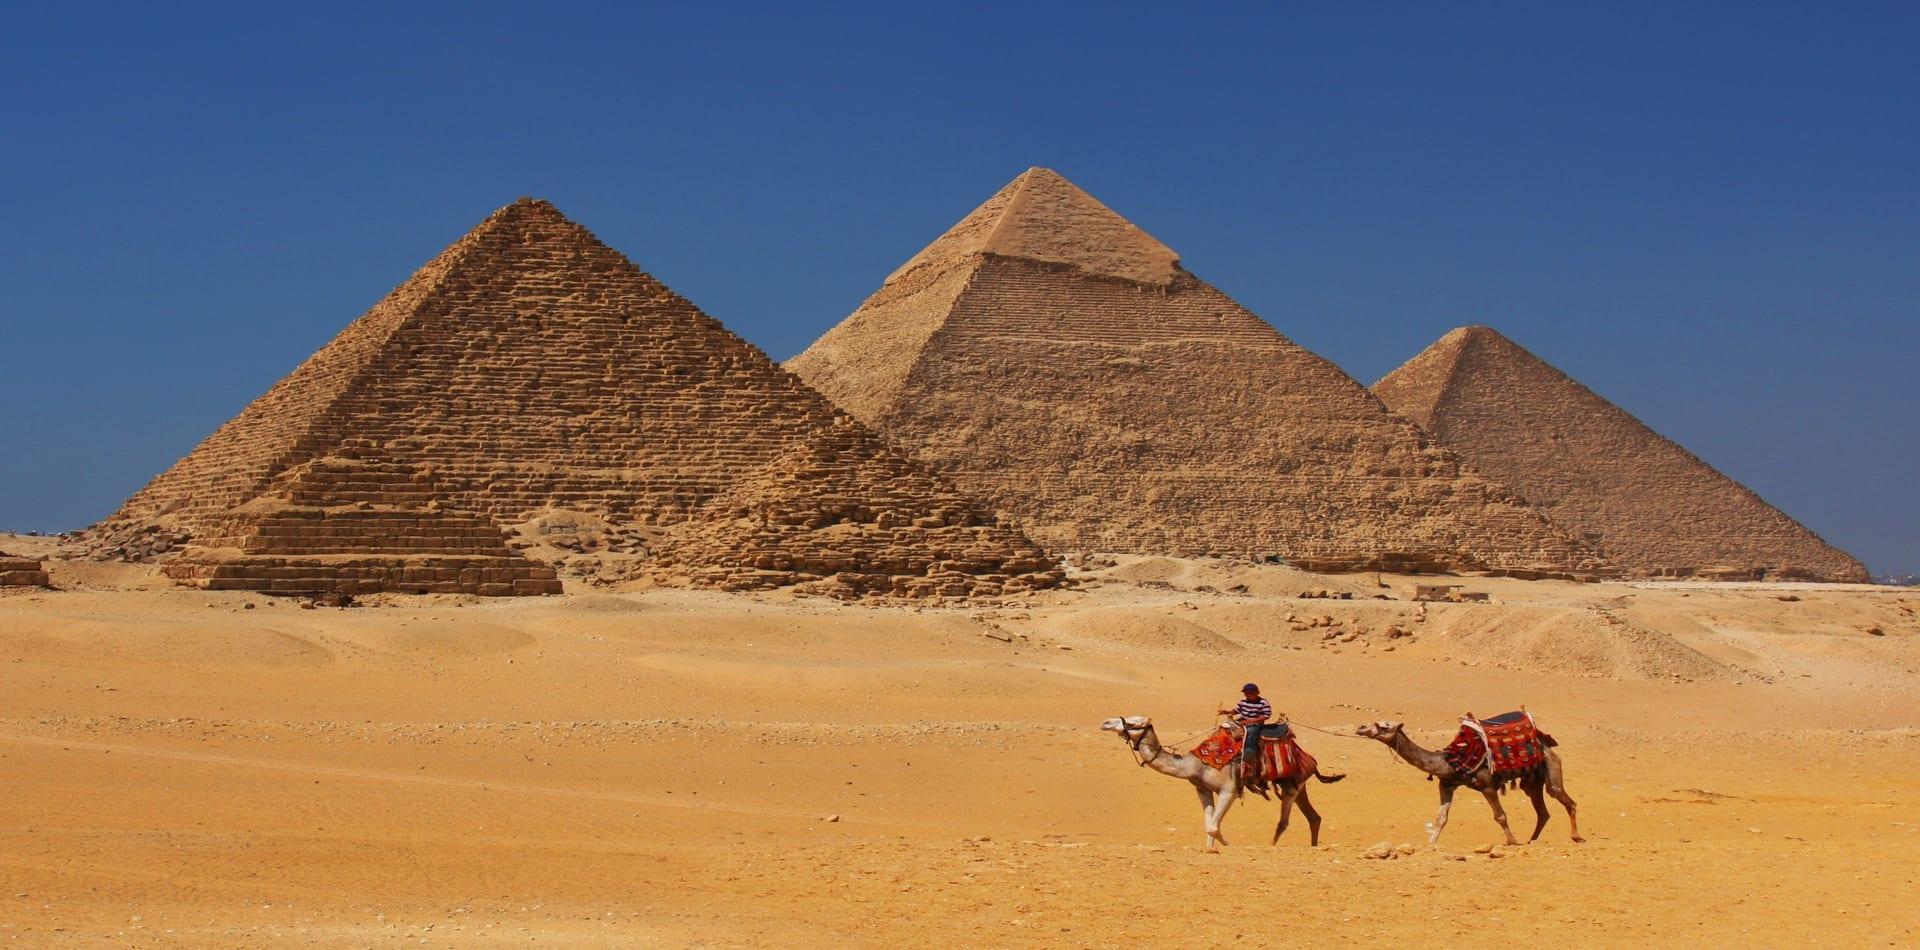 Pyramids landscape in Egypt